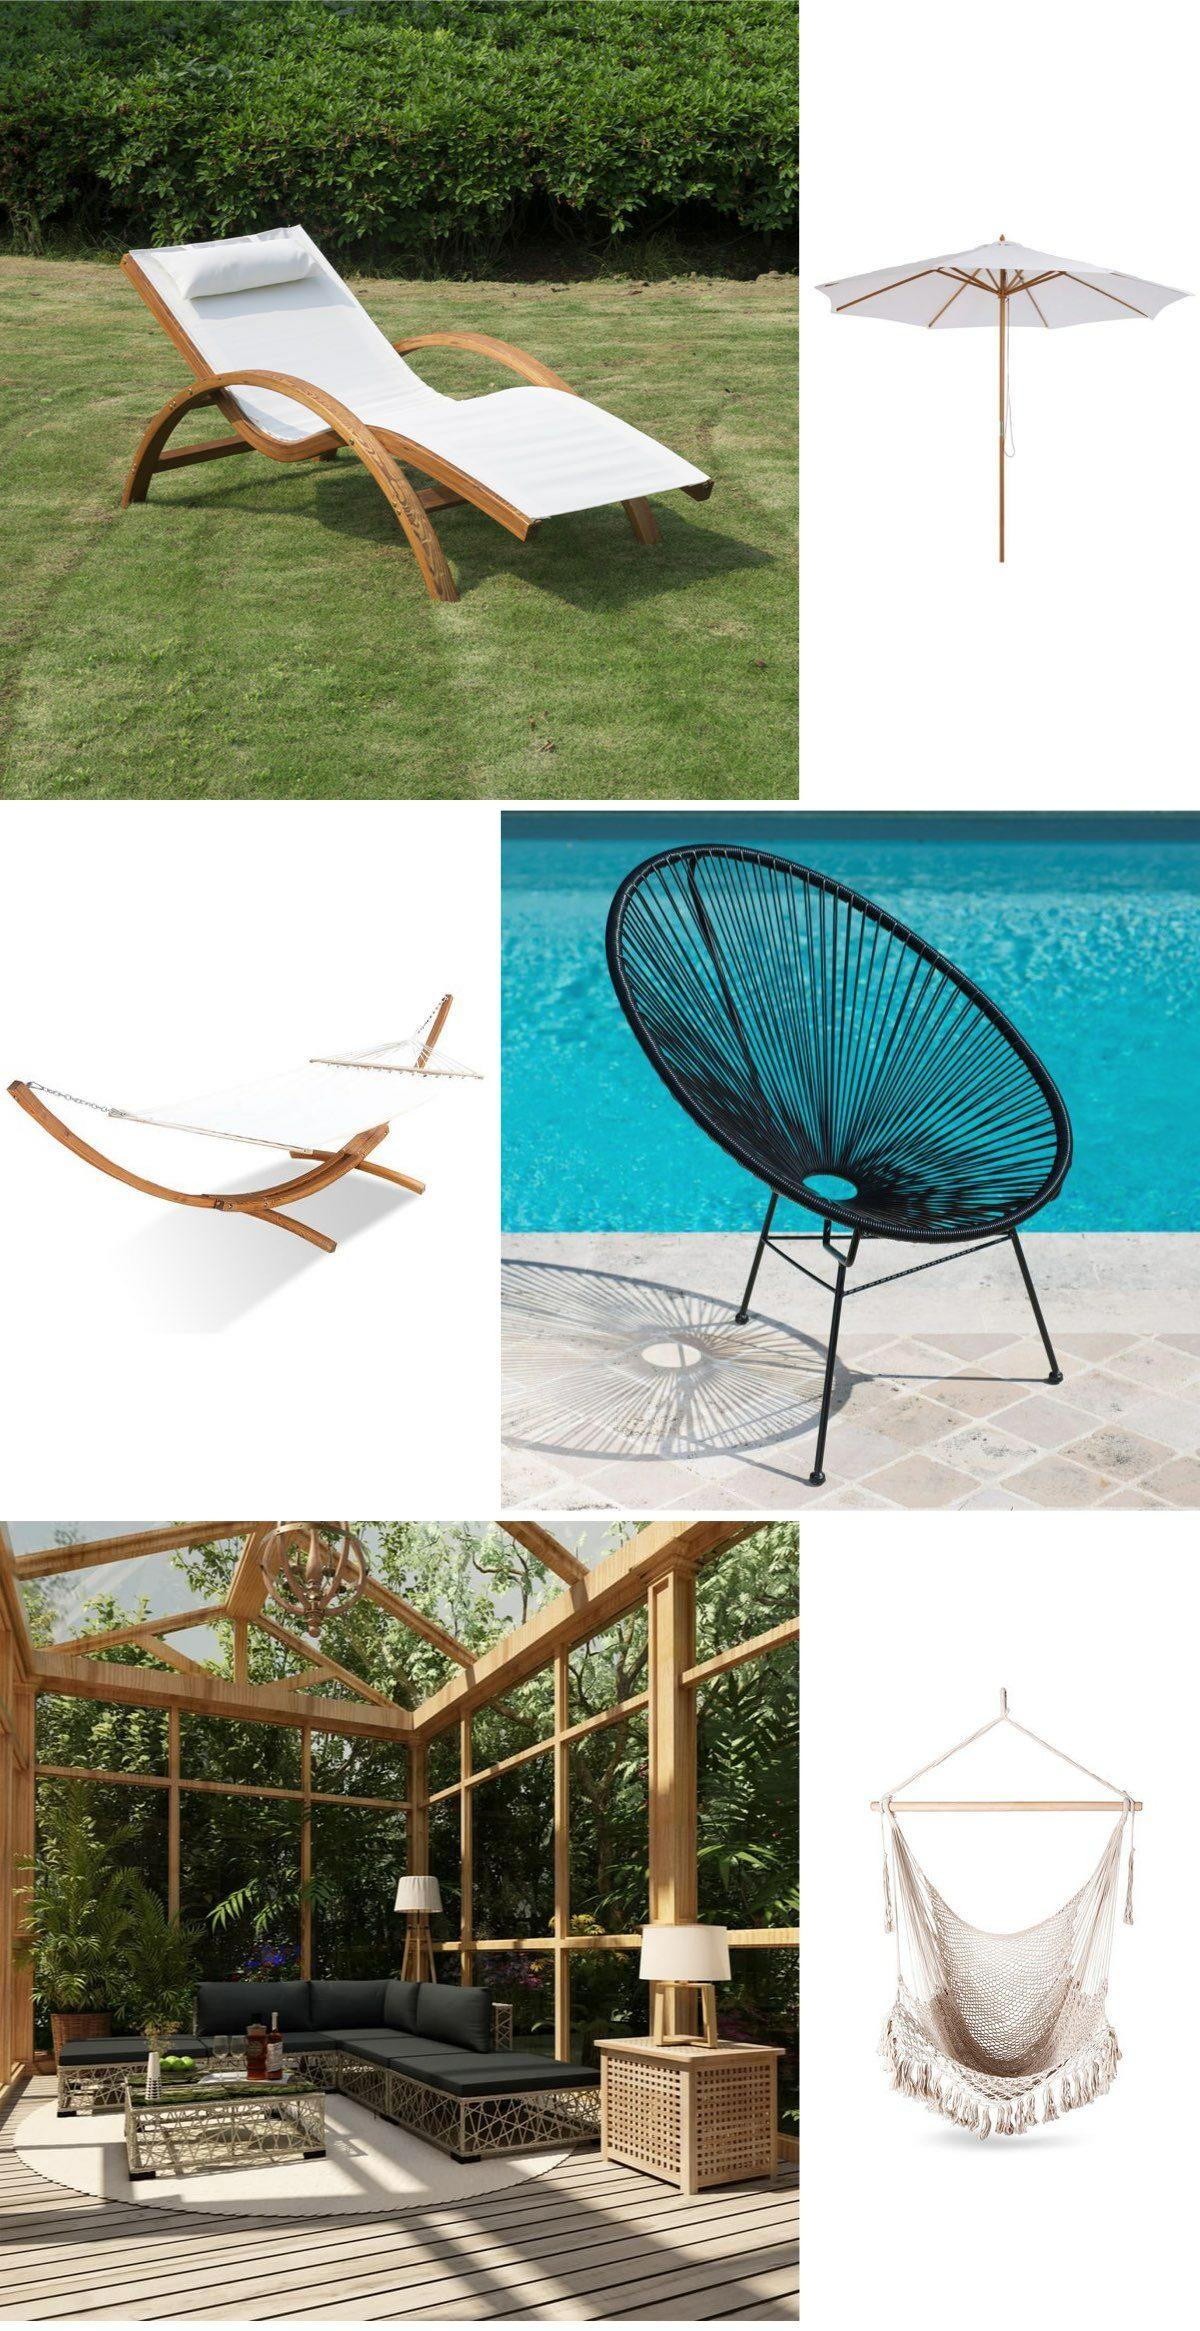 soldes 2020 manomano meuble jardin piscine transat bon plan